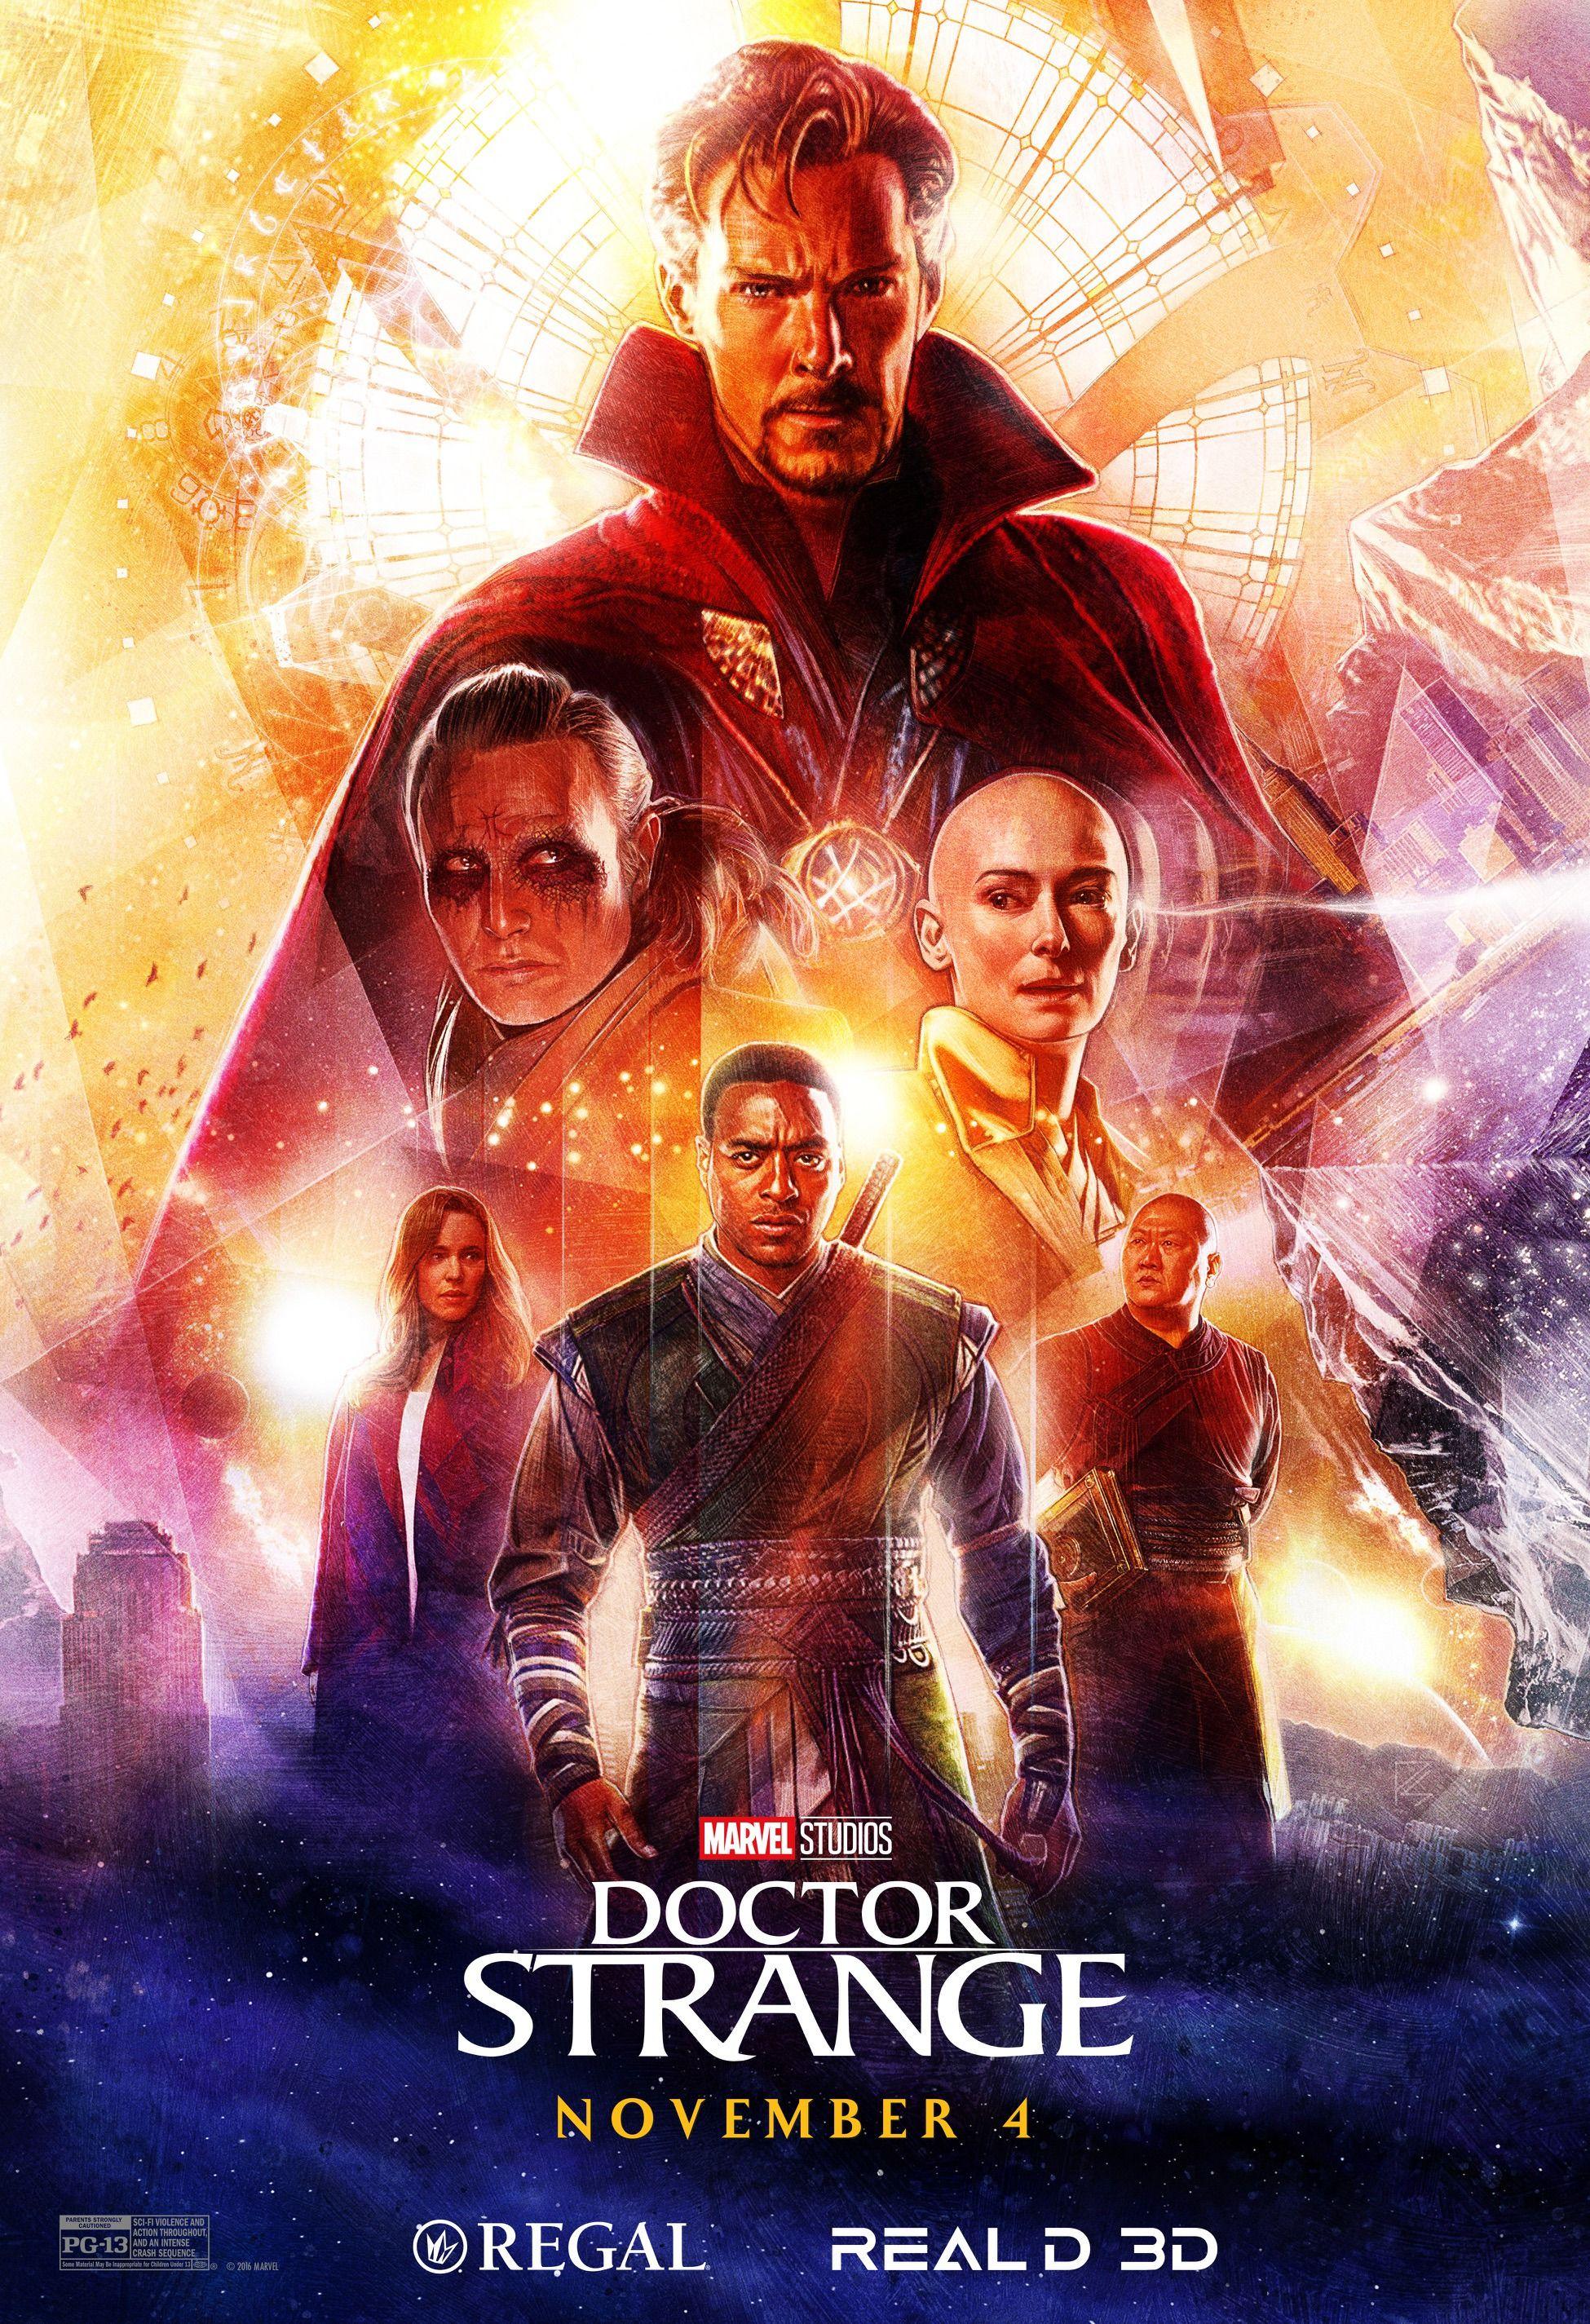 Return To The Main Poster Page For Doctor Strange 29 Of 29 Doutor Estranho Posteres De Filmes Posters De Filmes